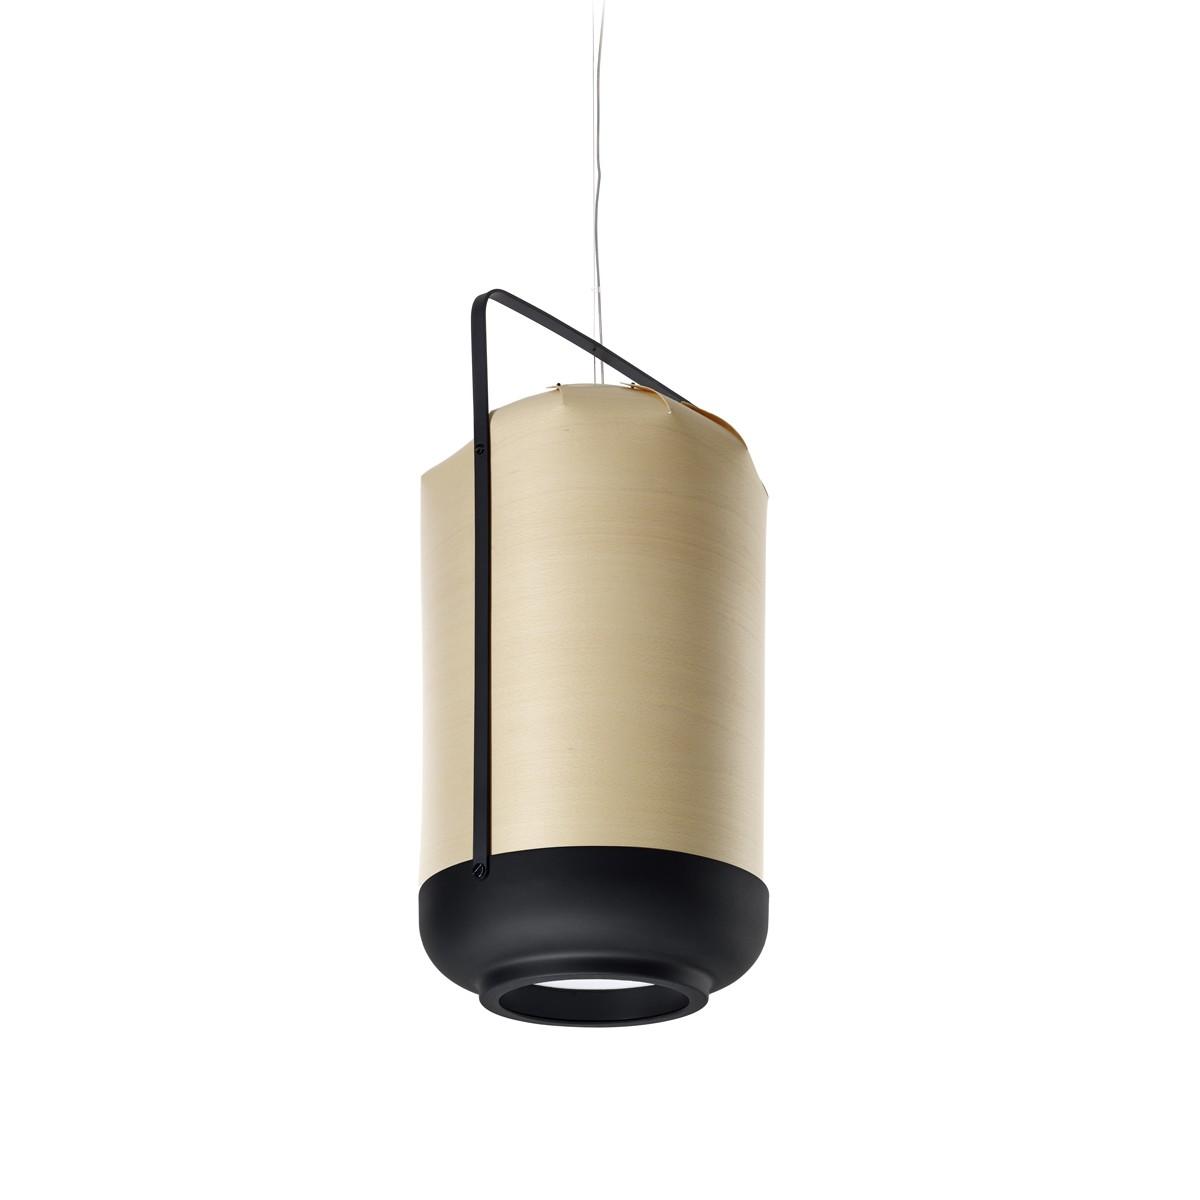 LZF Lamps Chou Tall Pendelleuchte, Buche